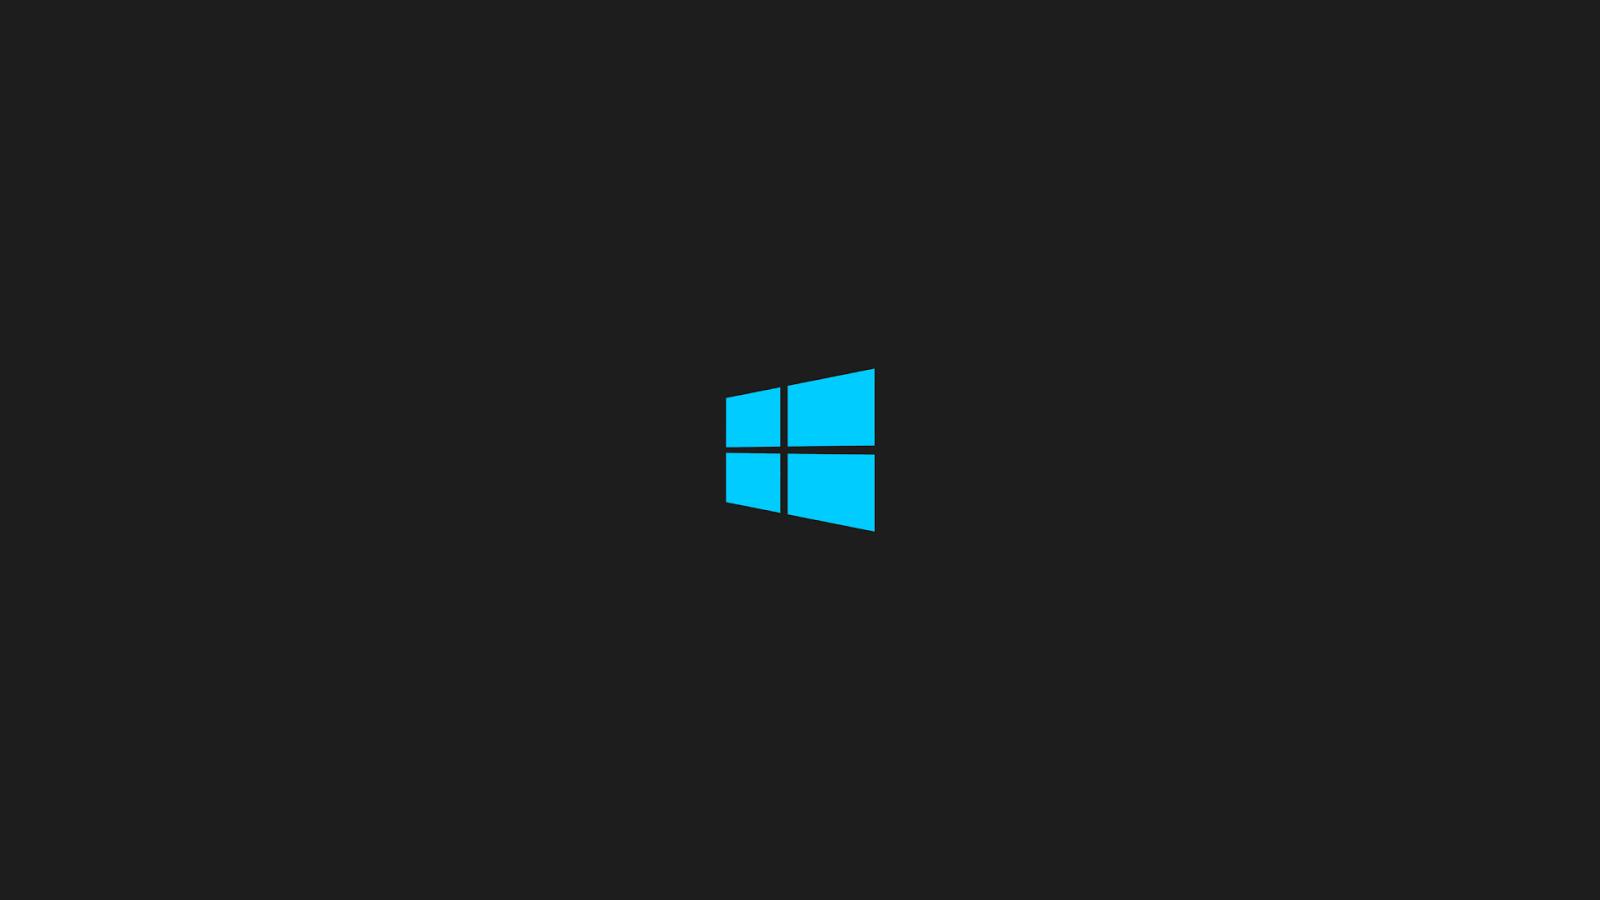 Windows 8 Wallpaper Set 10 2013 Wallpaper 1600x900